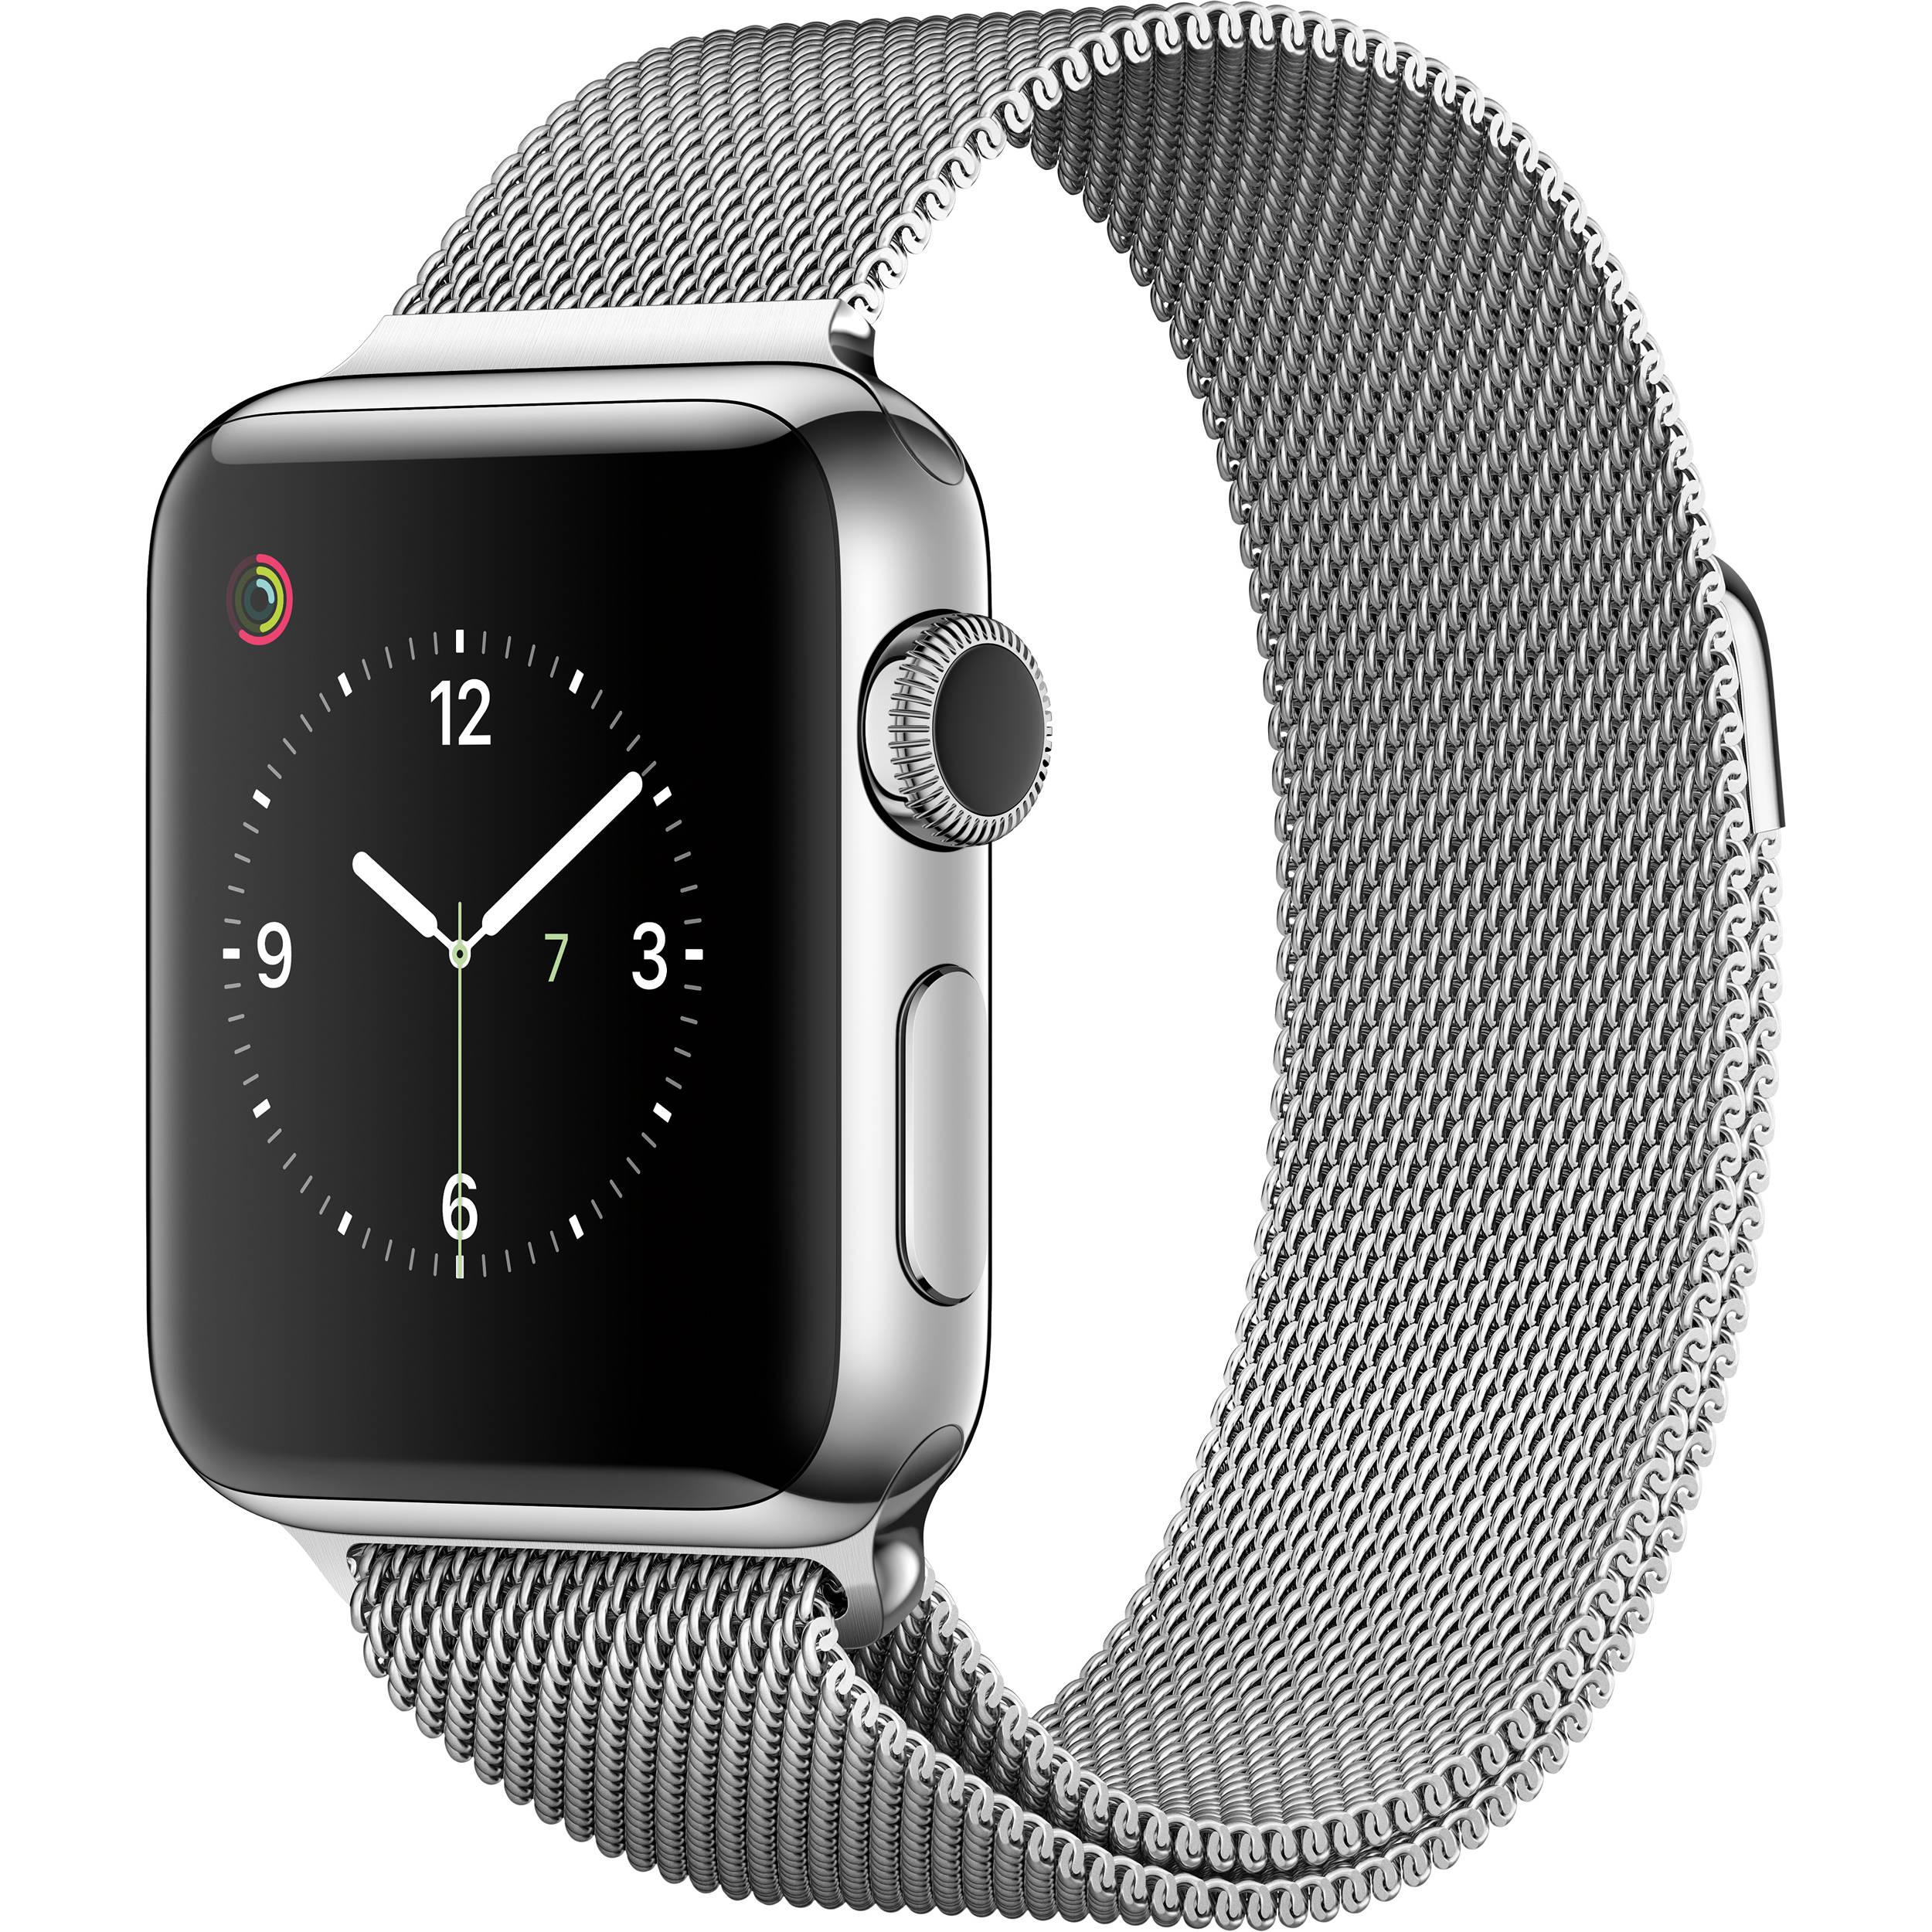 c5dab61d614 Used Apple Watch Series 2 38mm Smartwatch MNP62LL A B H Photo